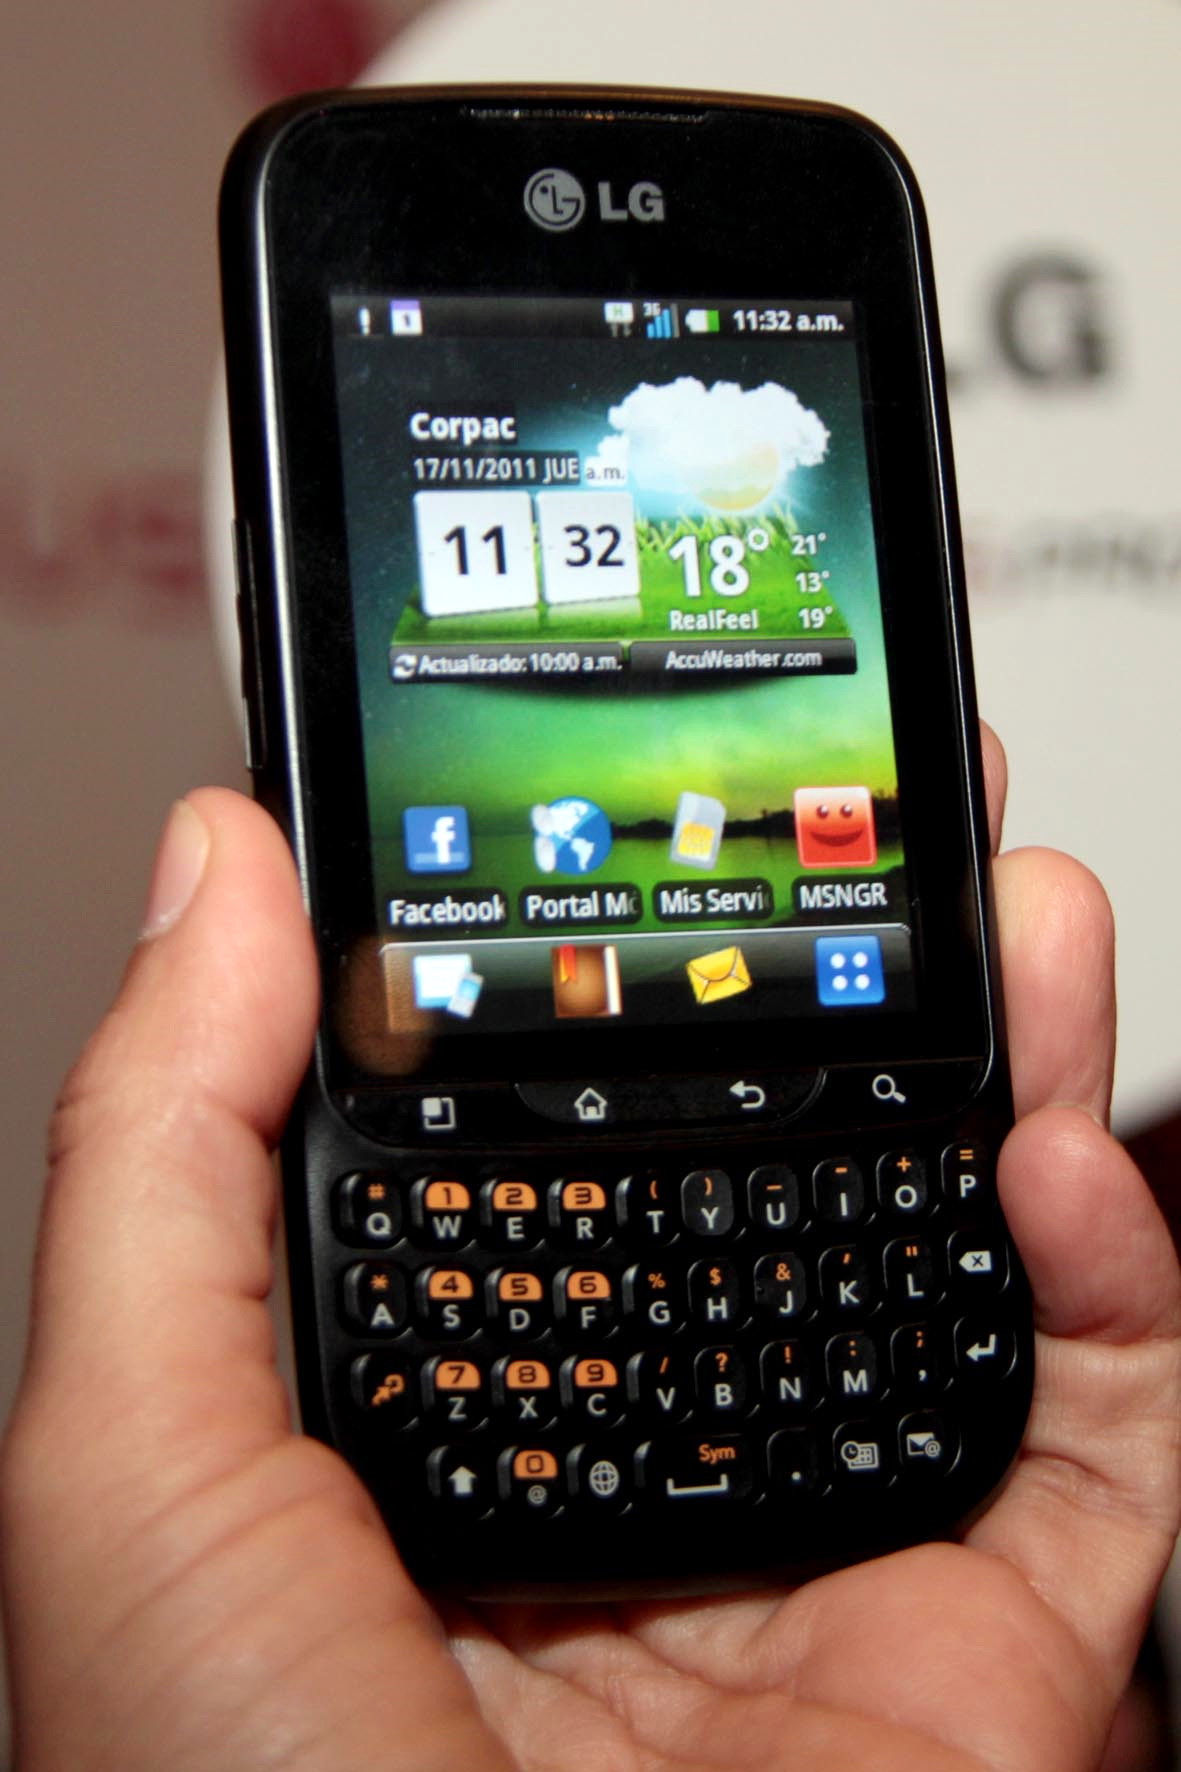 LG MOBILE PHONE  LG Optimus Pro C660